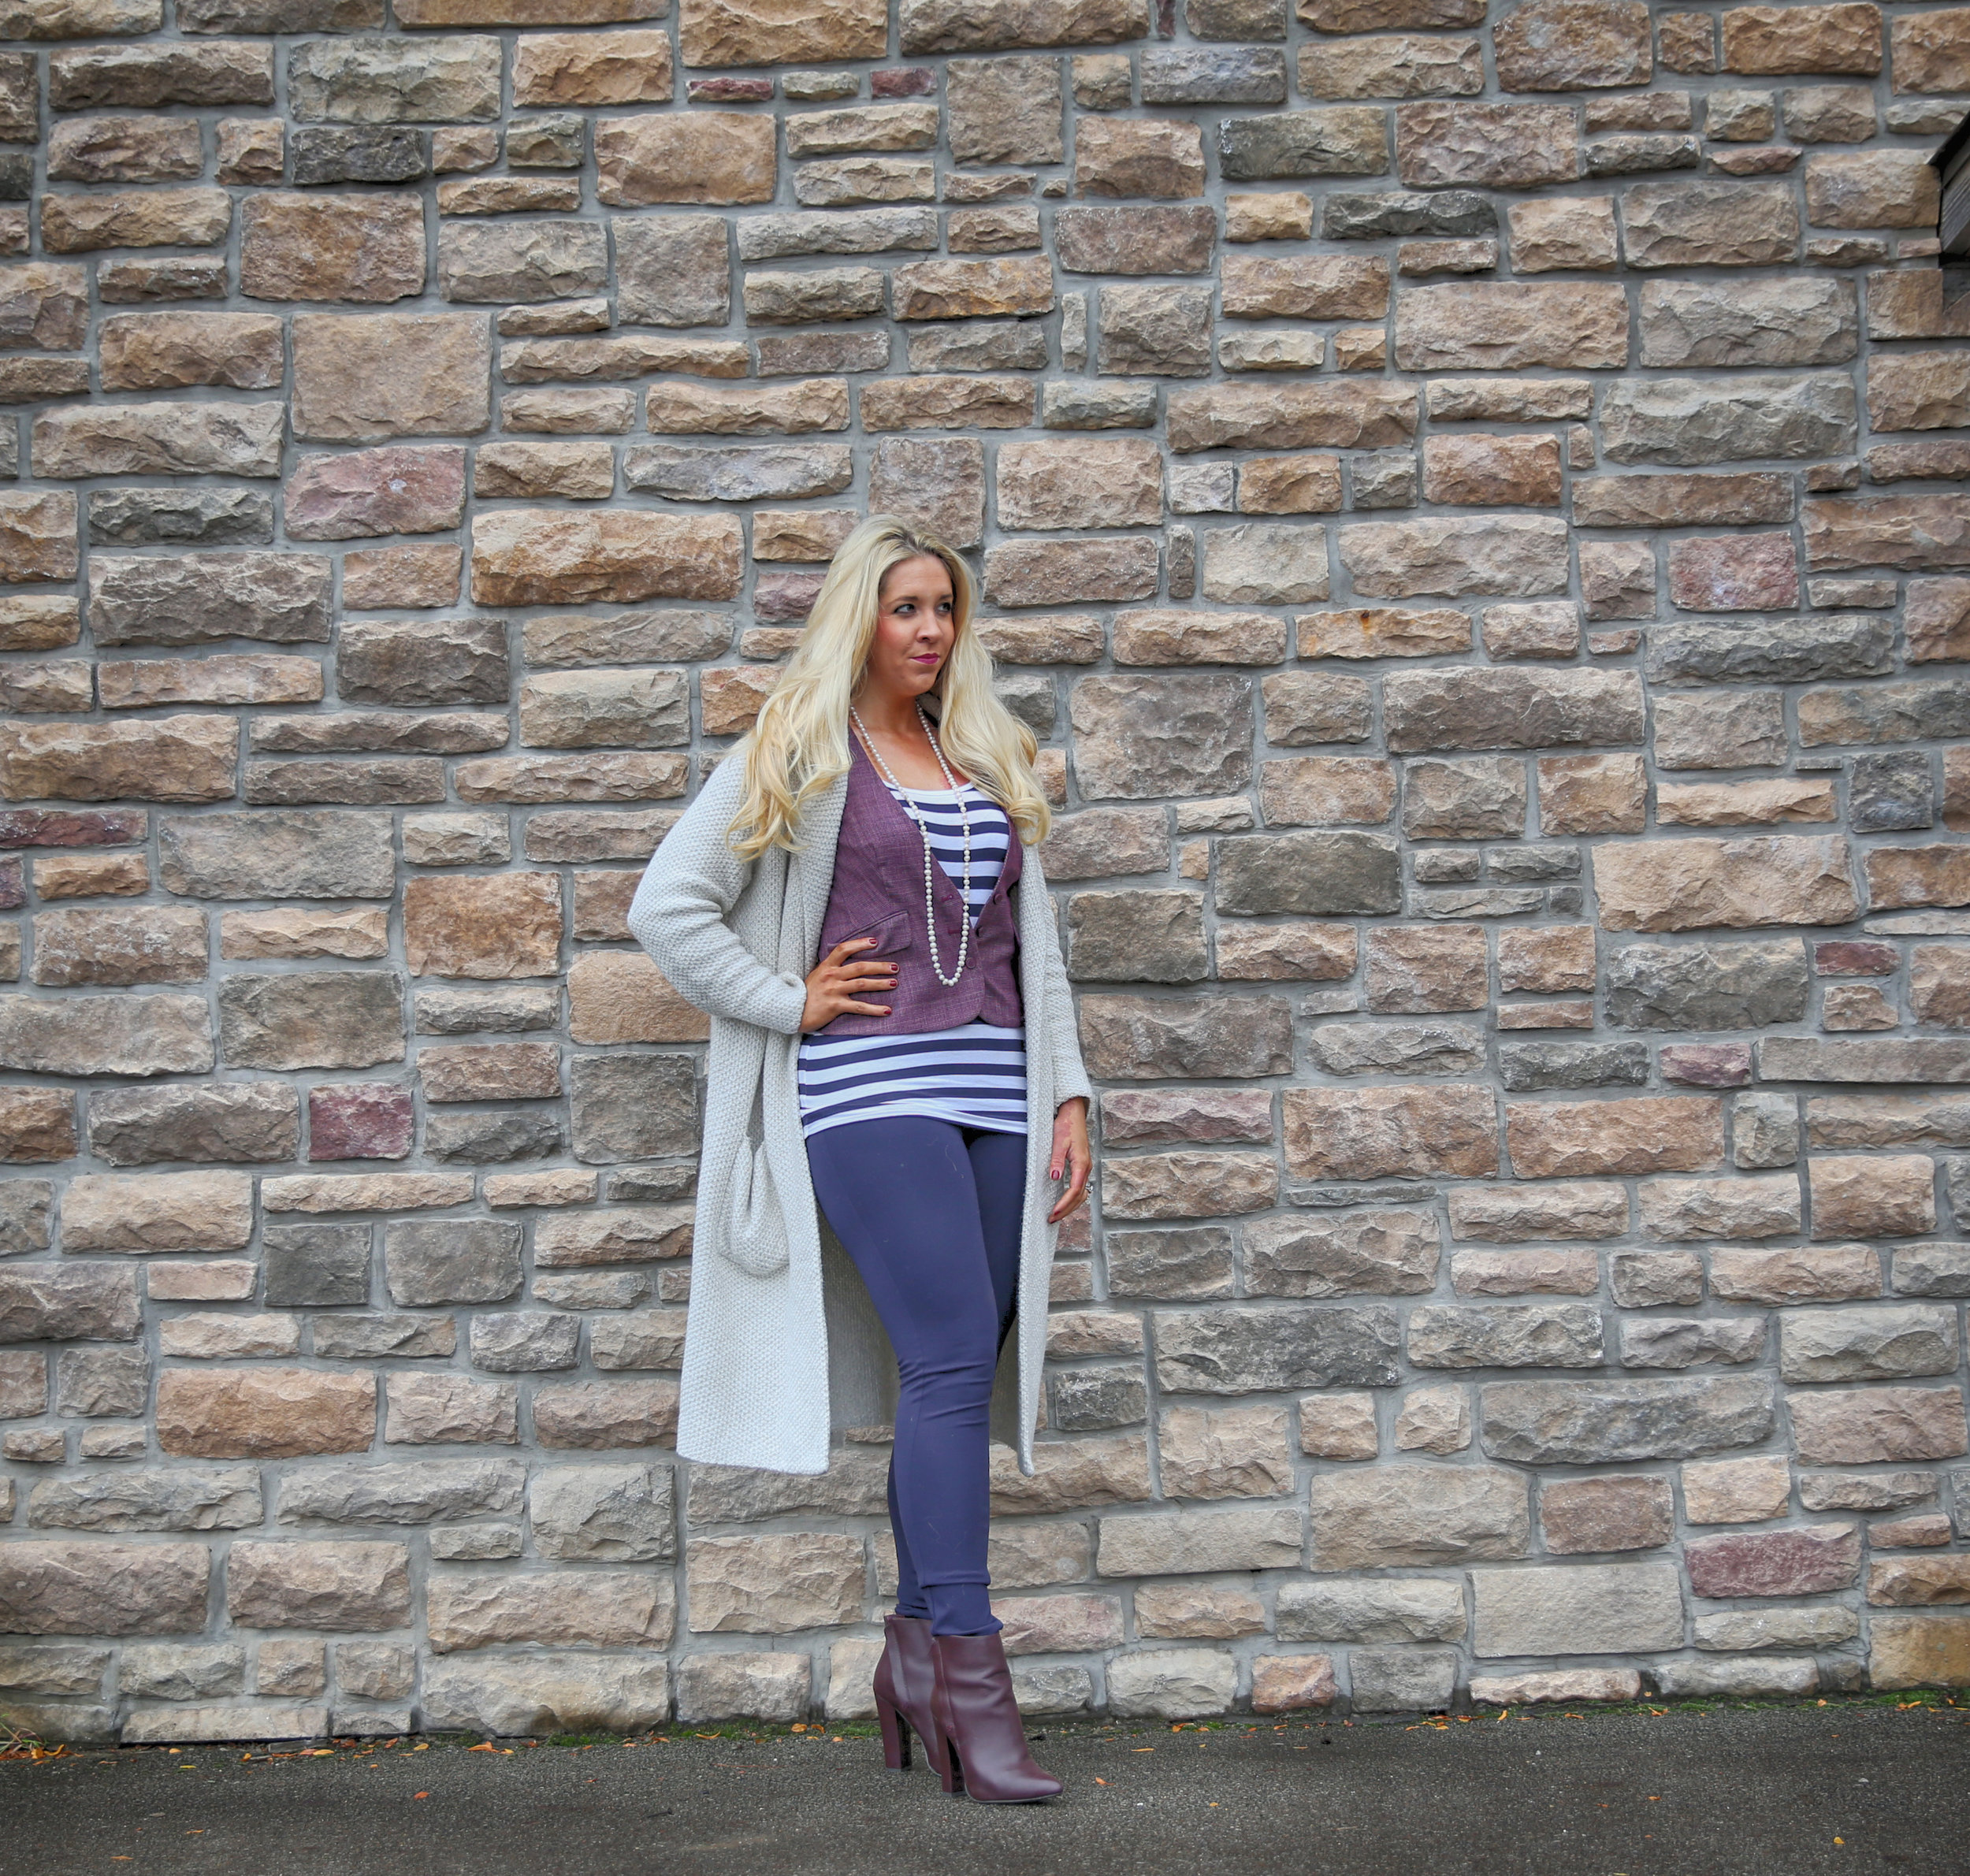 Find a similar long sweater here:  http://www.target.com/p/women-s-long-open-layer-cardigan-merona/-/A-50803872